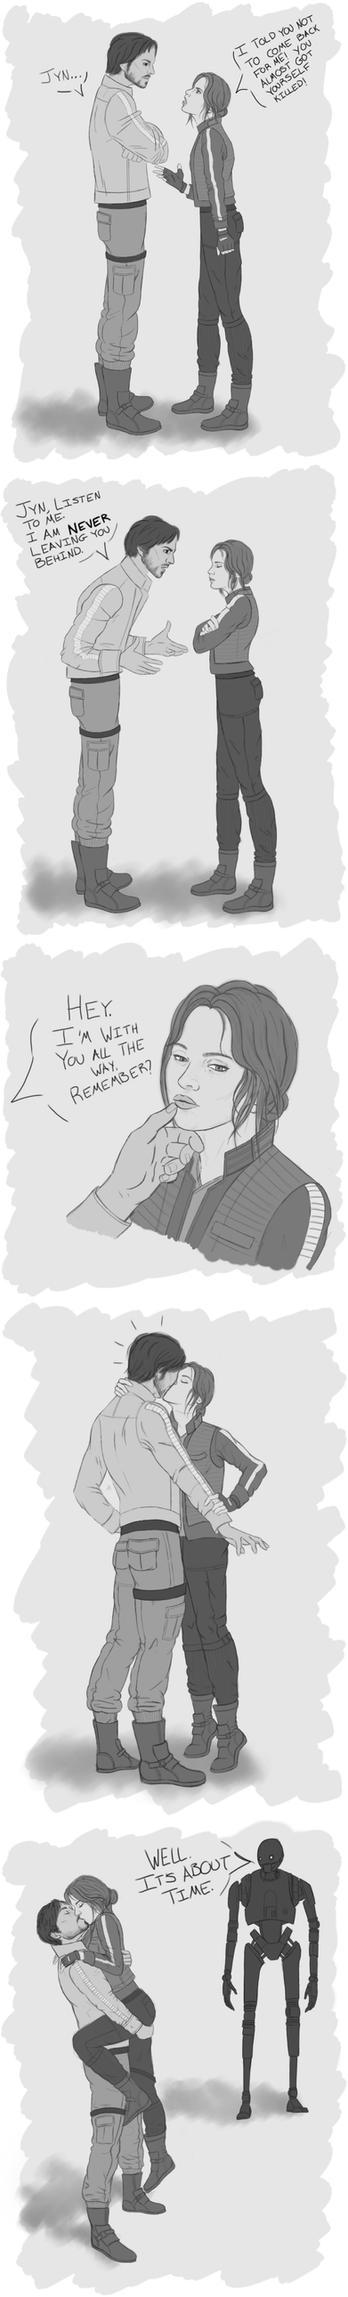 RebelCaptain Doodles by TheWindAndSea